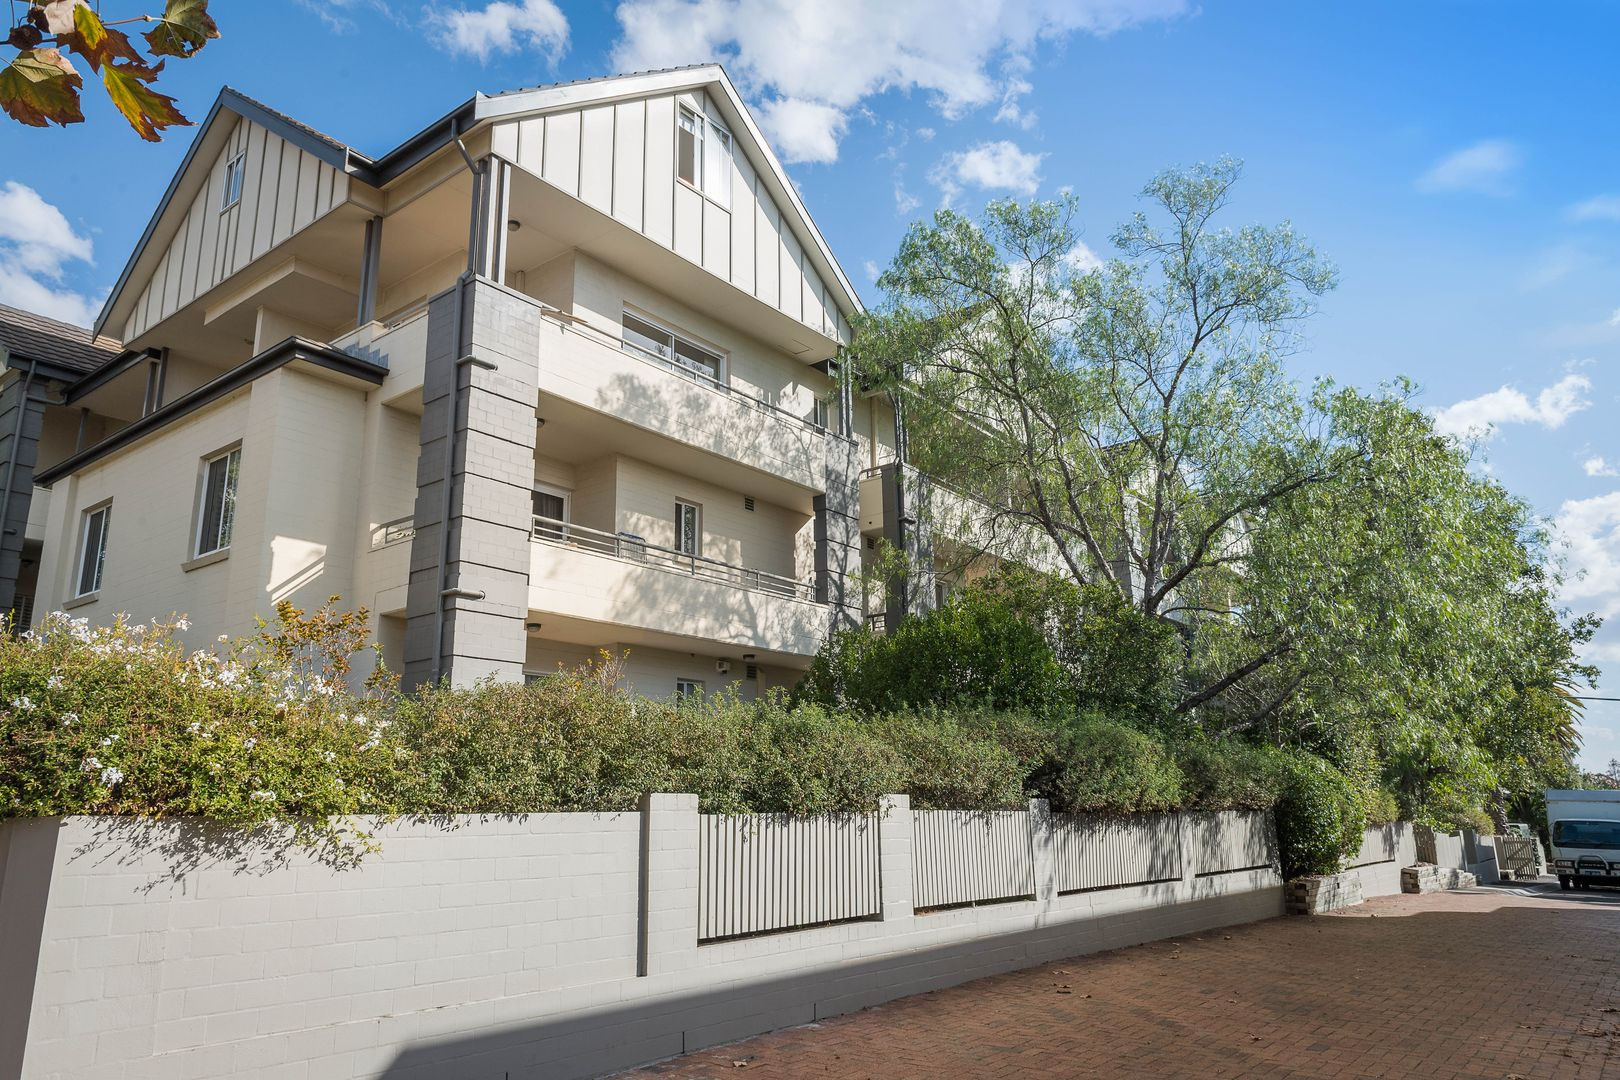 58/252 Willoughby  Road, Naremburn NSW 2065, Image 0